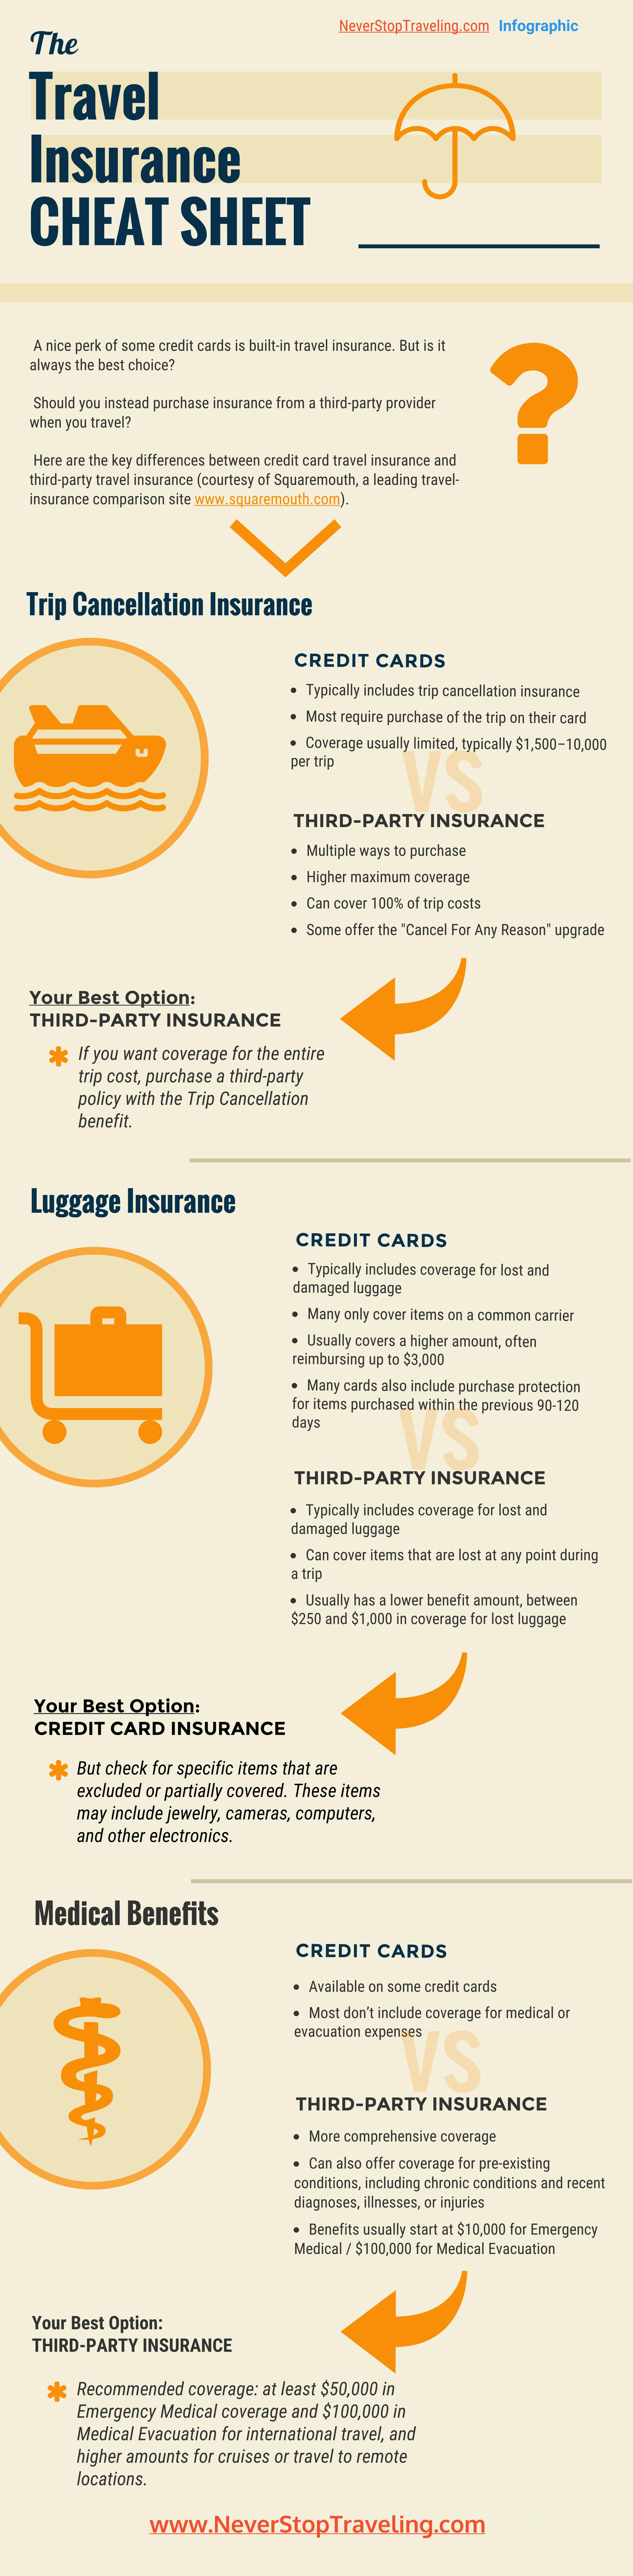 Do You Need Rental Car Insurance In Europe